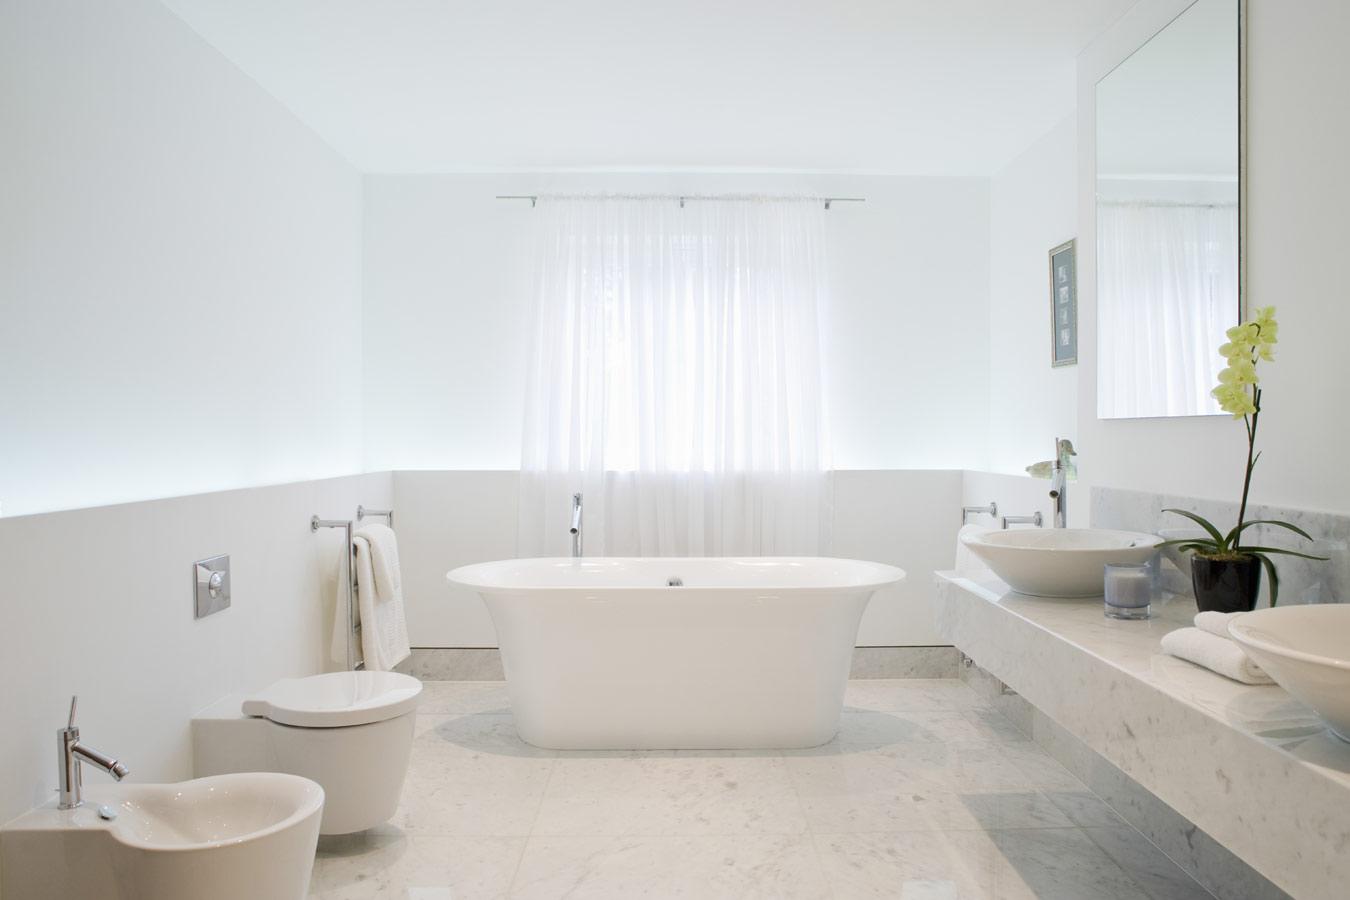 plafond badkamer welke plafondbekleding kiezen?, Meubels Ideeën